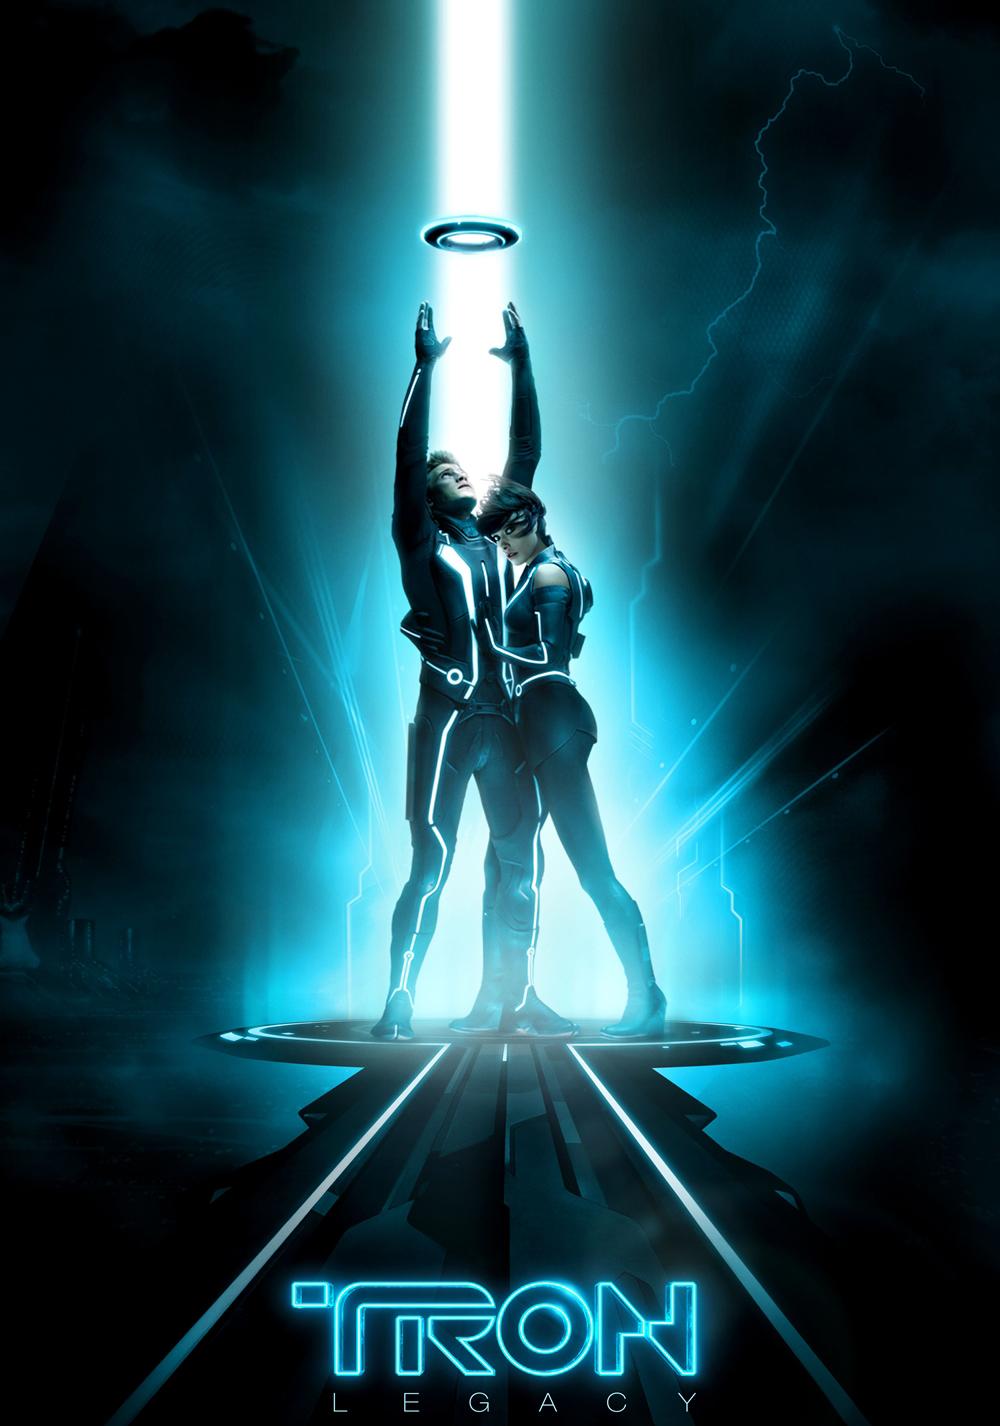 Image Tron Legacy Poster 1 Jpg Disney Wiki Fandom